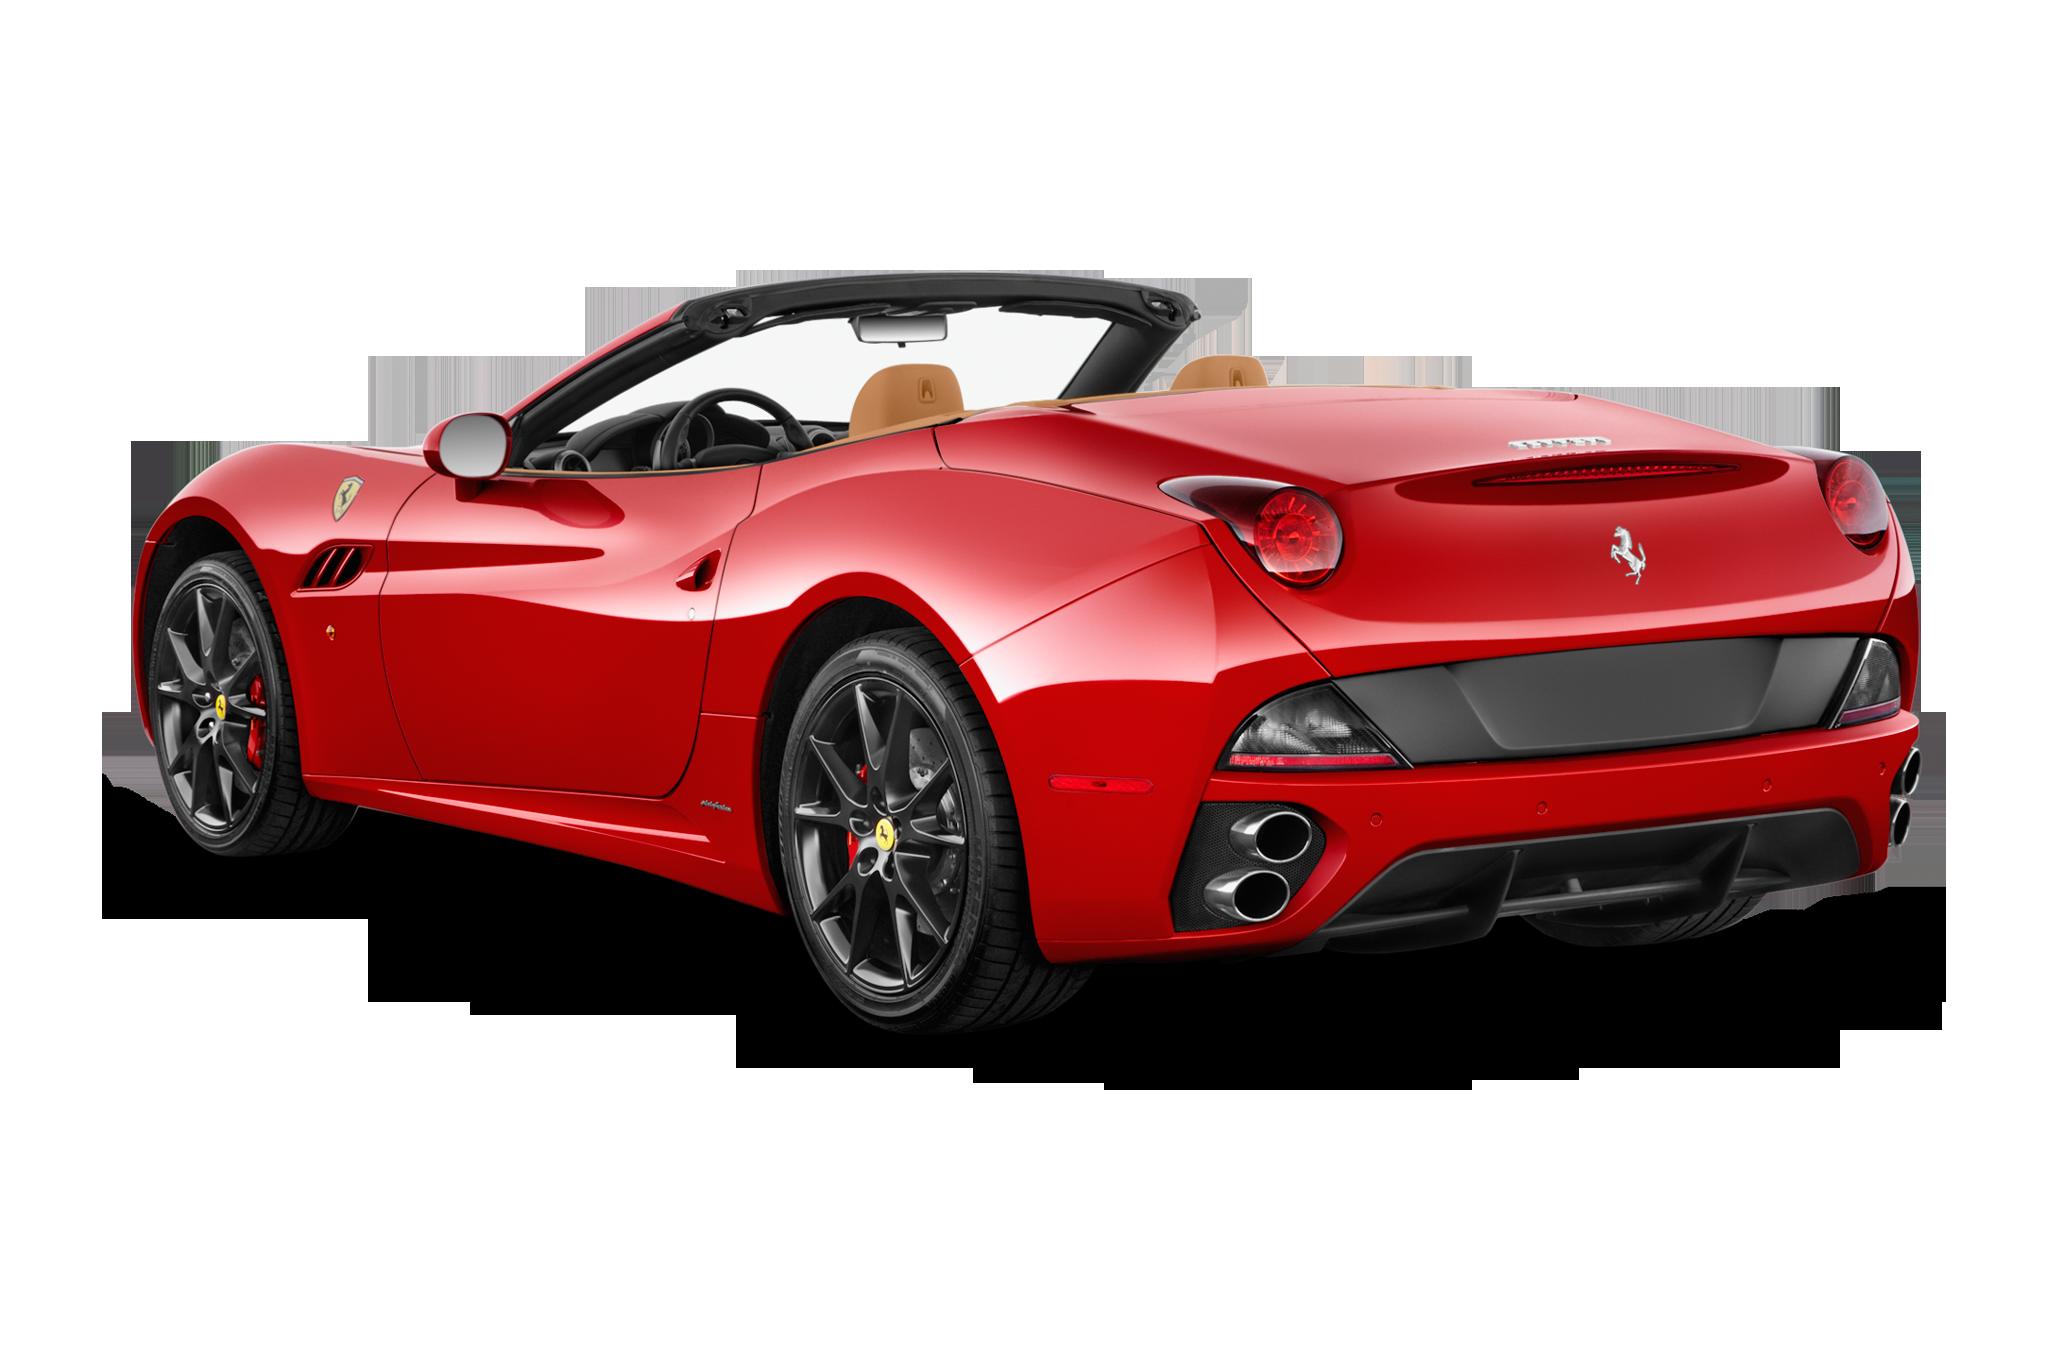 2009 Ferrari California - Ferrari Sport Coupe Review ...